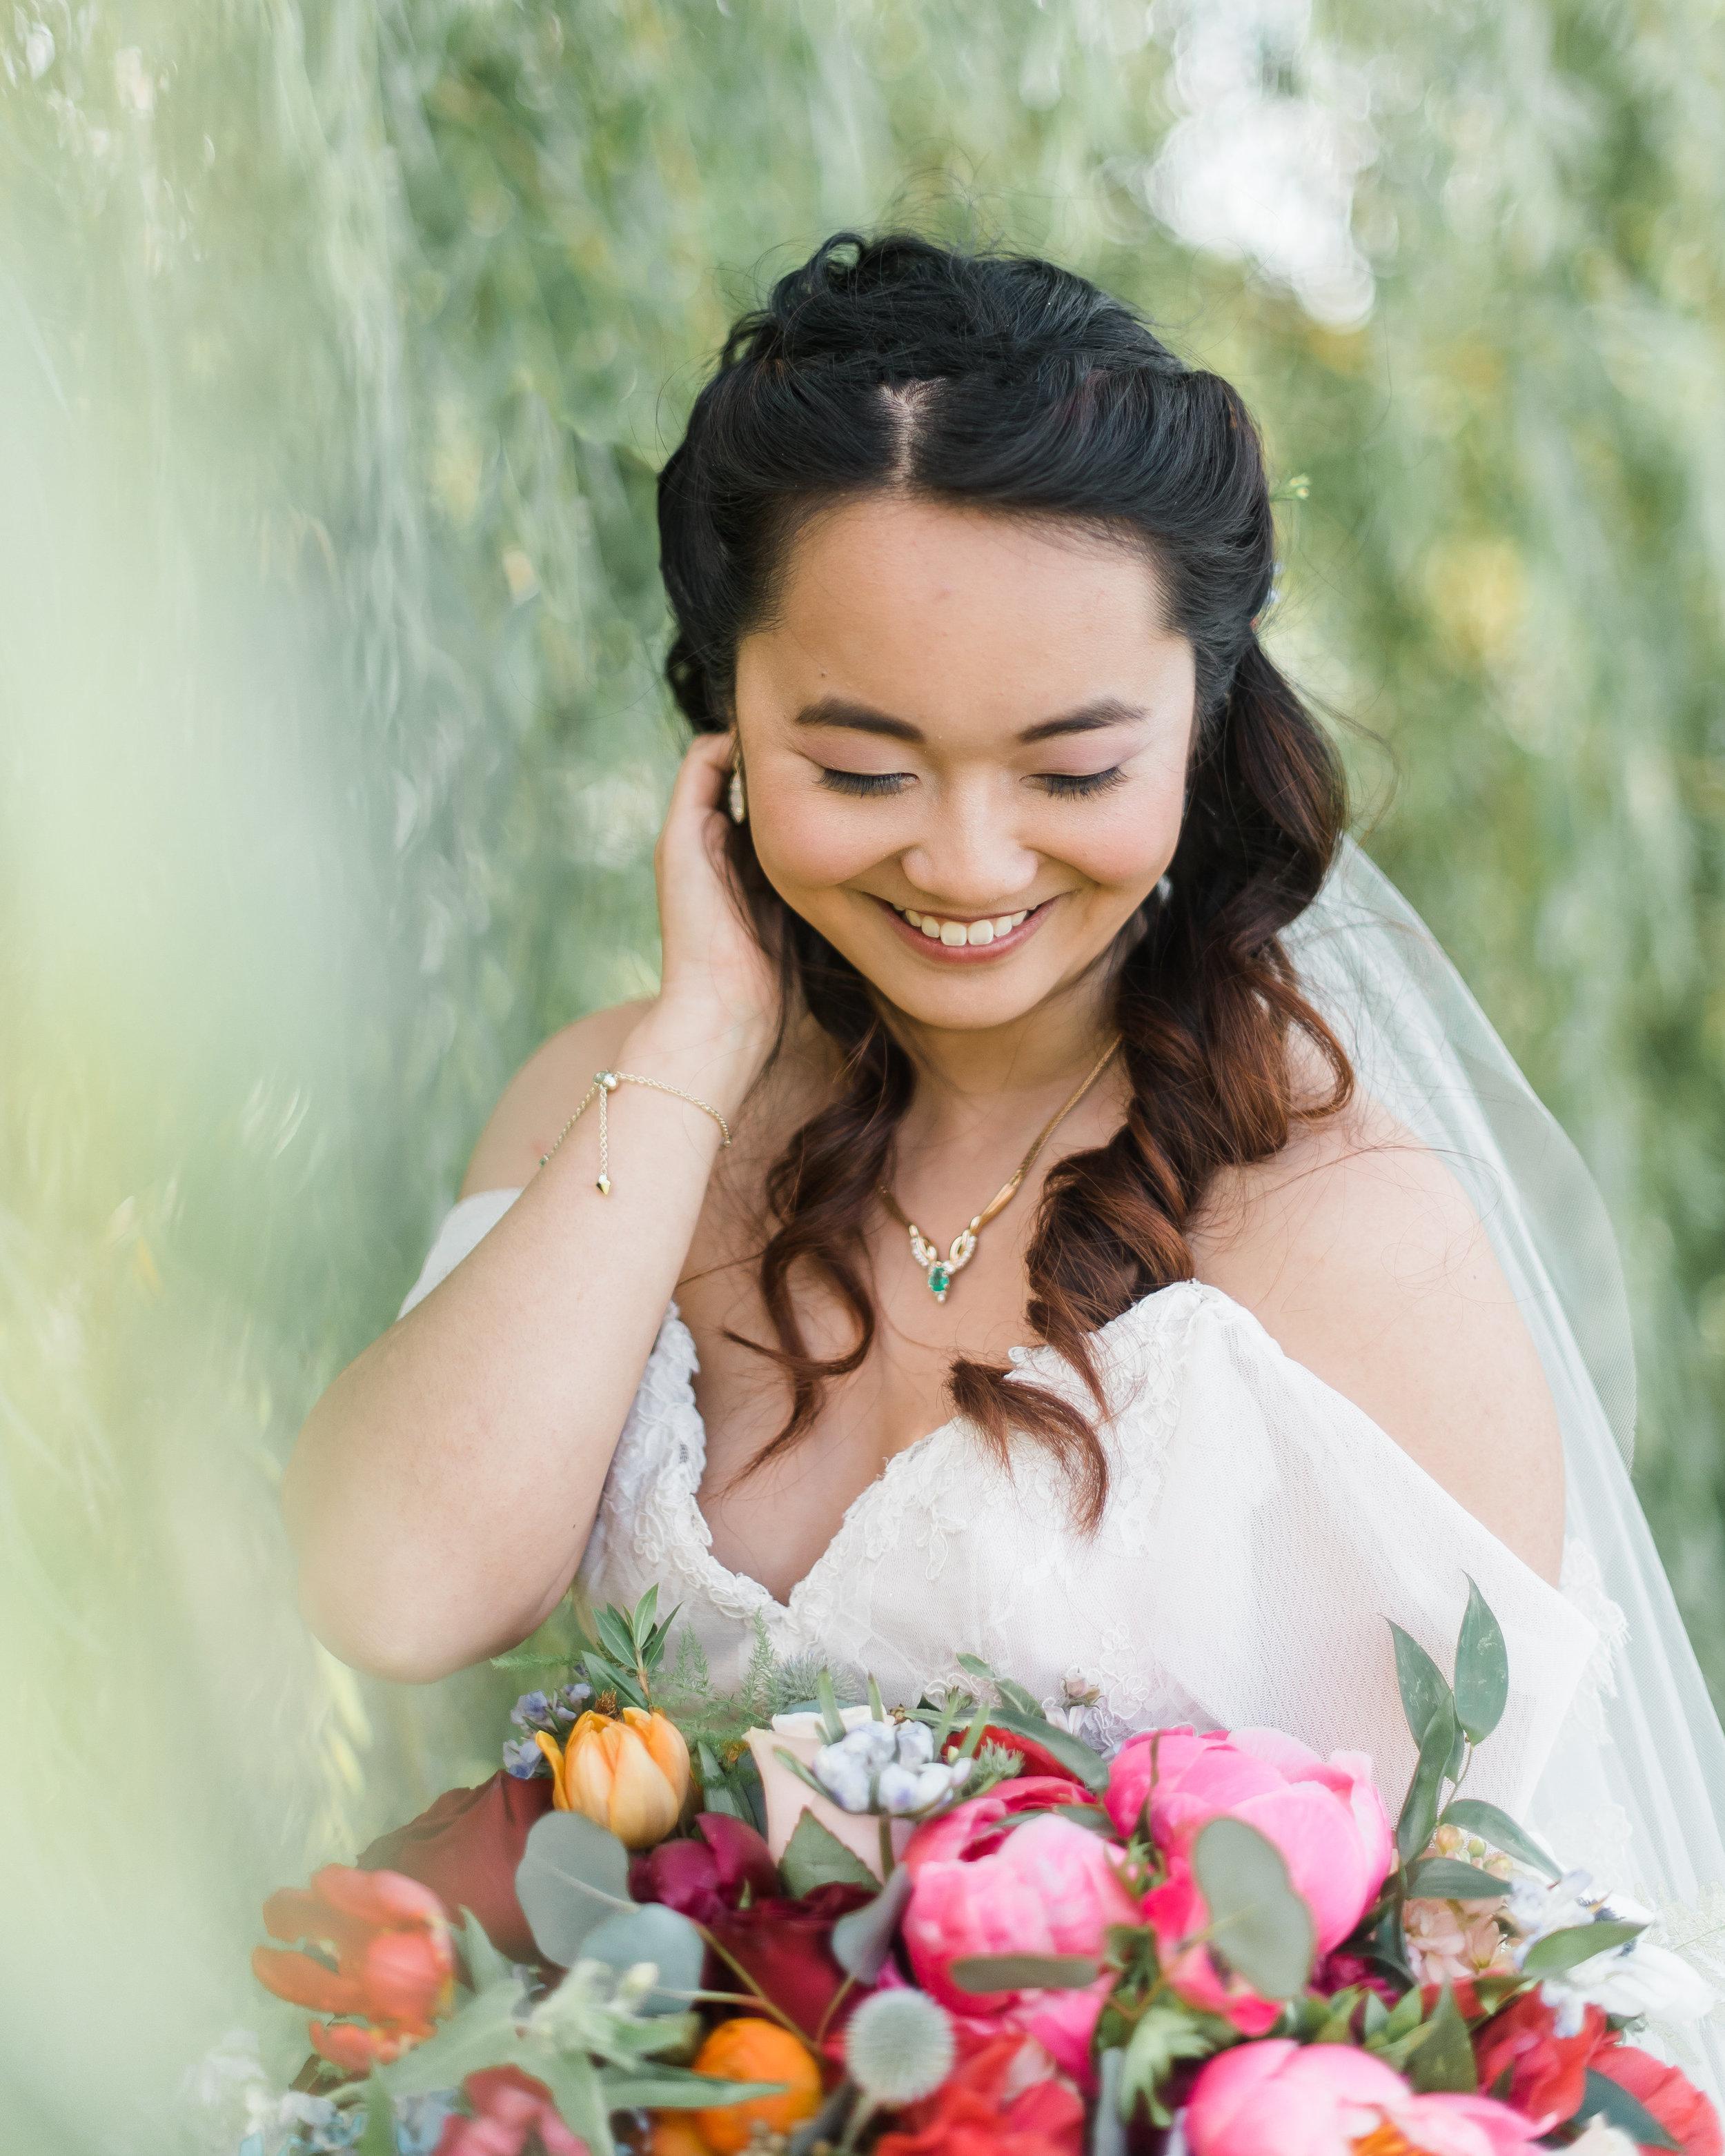 pittsburgh-wedding-photographer-rustic-acres-farm-summer-boho-wedding0010.jpg